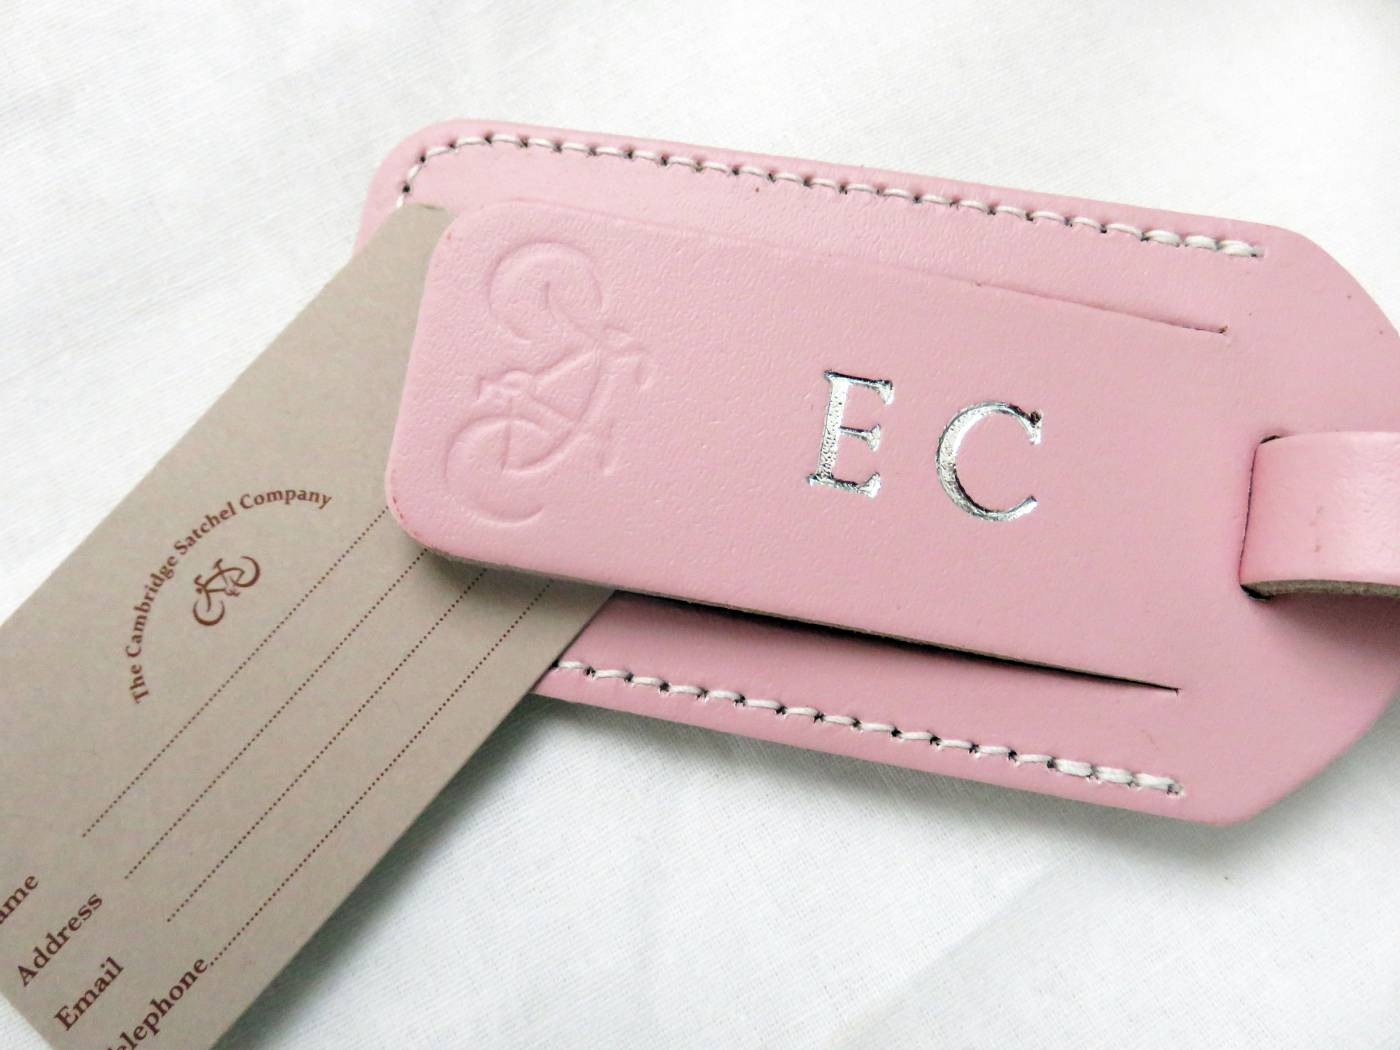 cambridge satchel company engrave